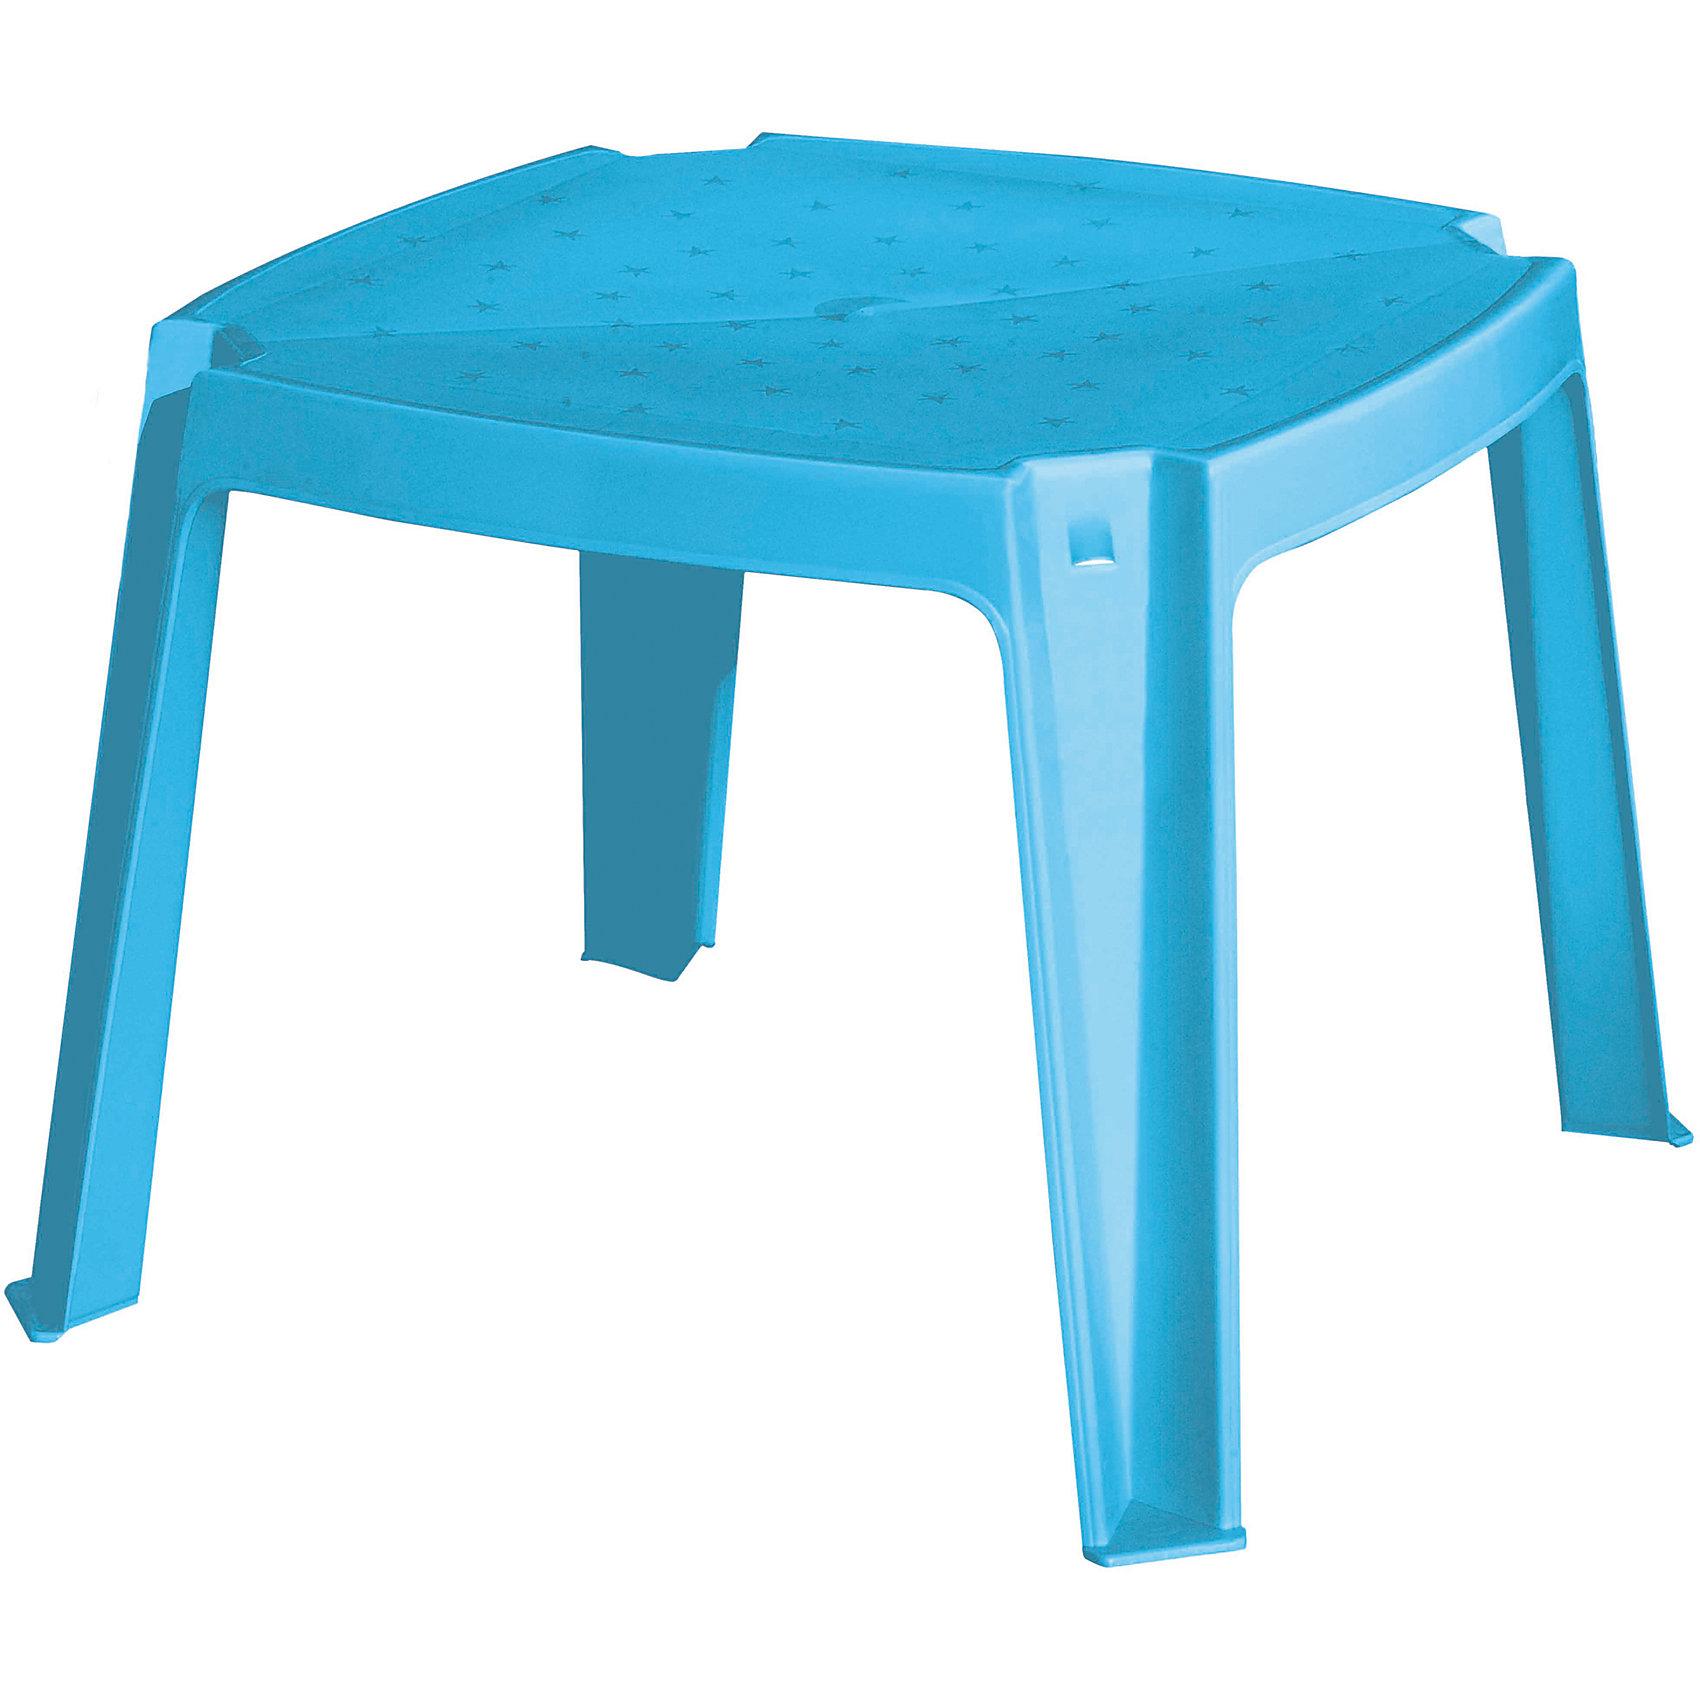 Стол без карманов, Marian Plast